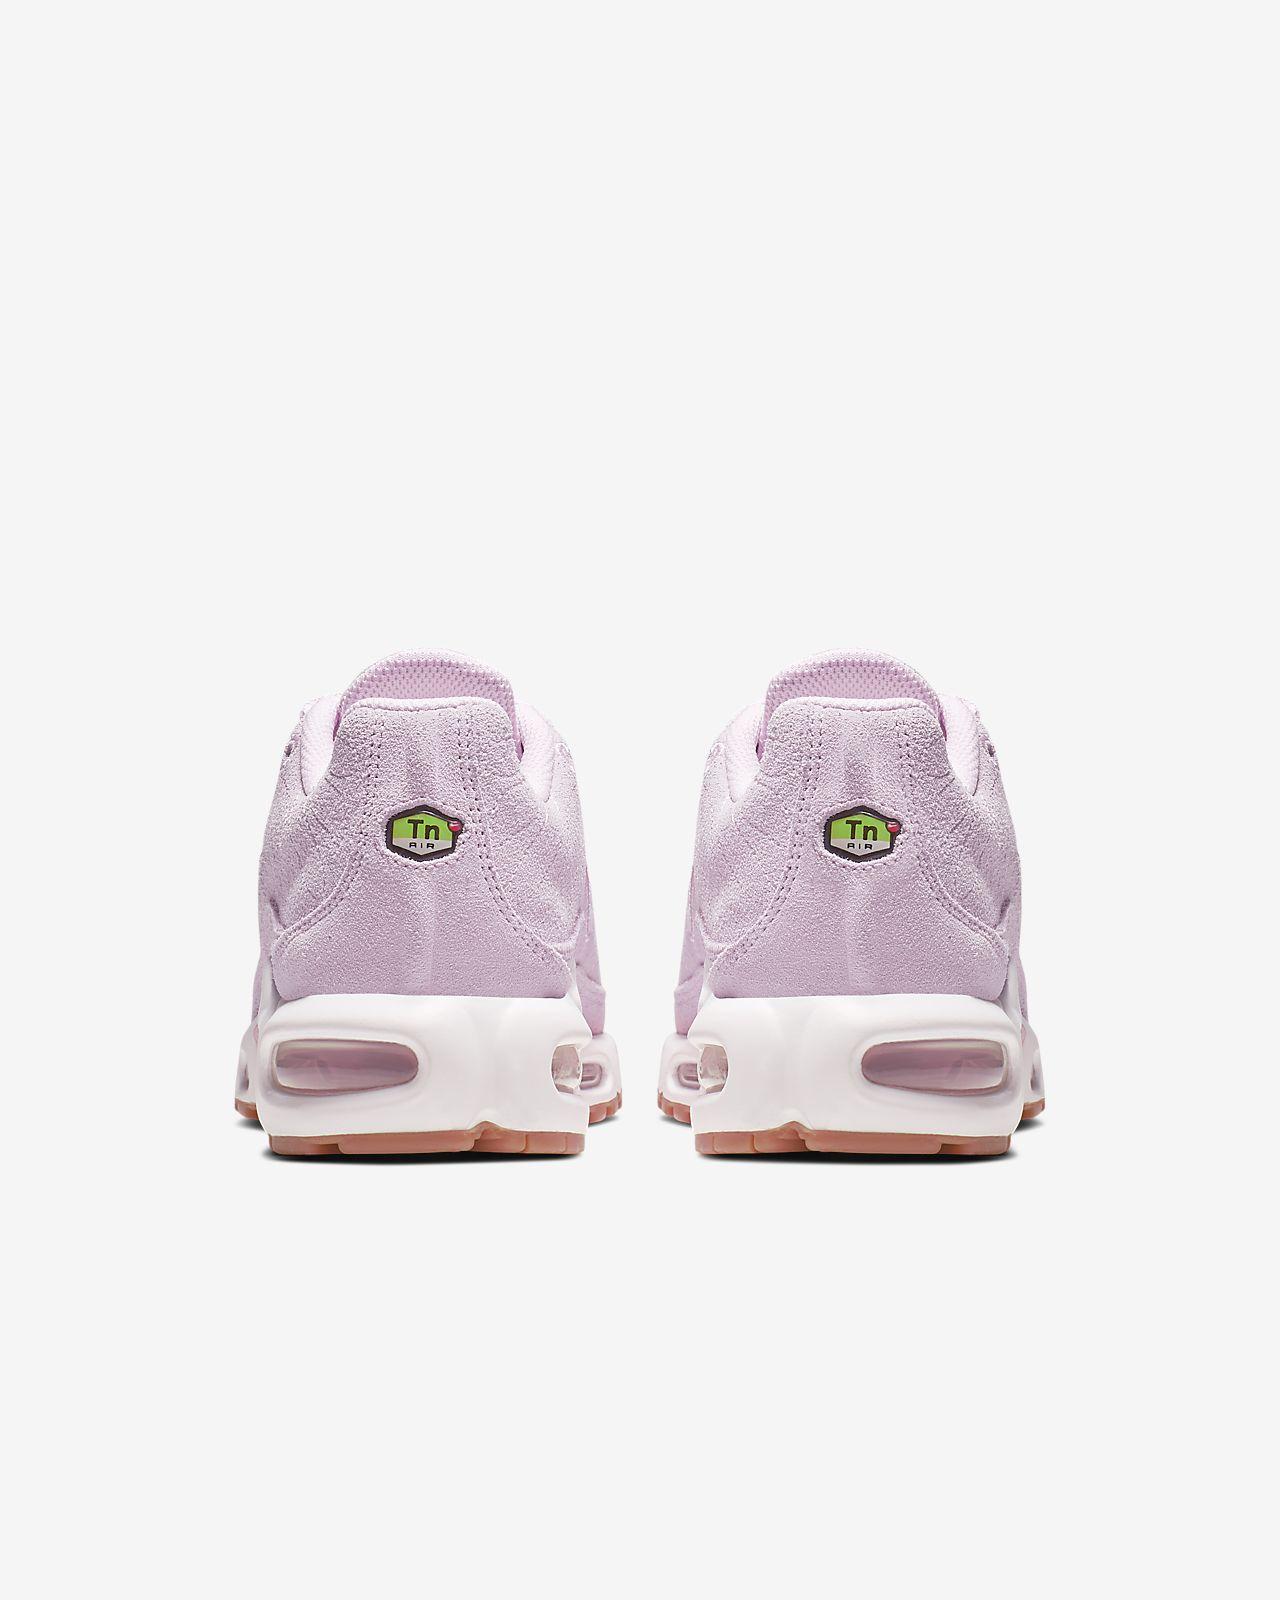 Plus Femme Air Premium Chaussure Nike Max Pour IYWeED2bH9